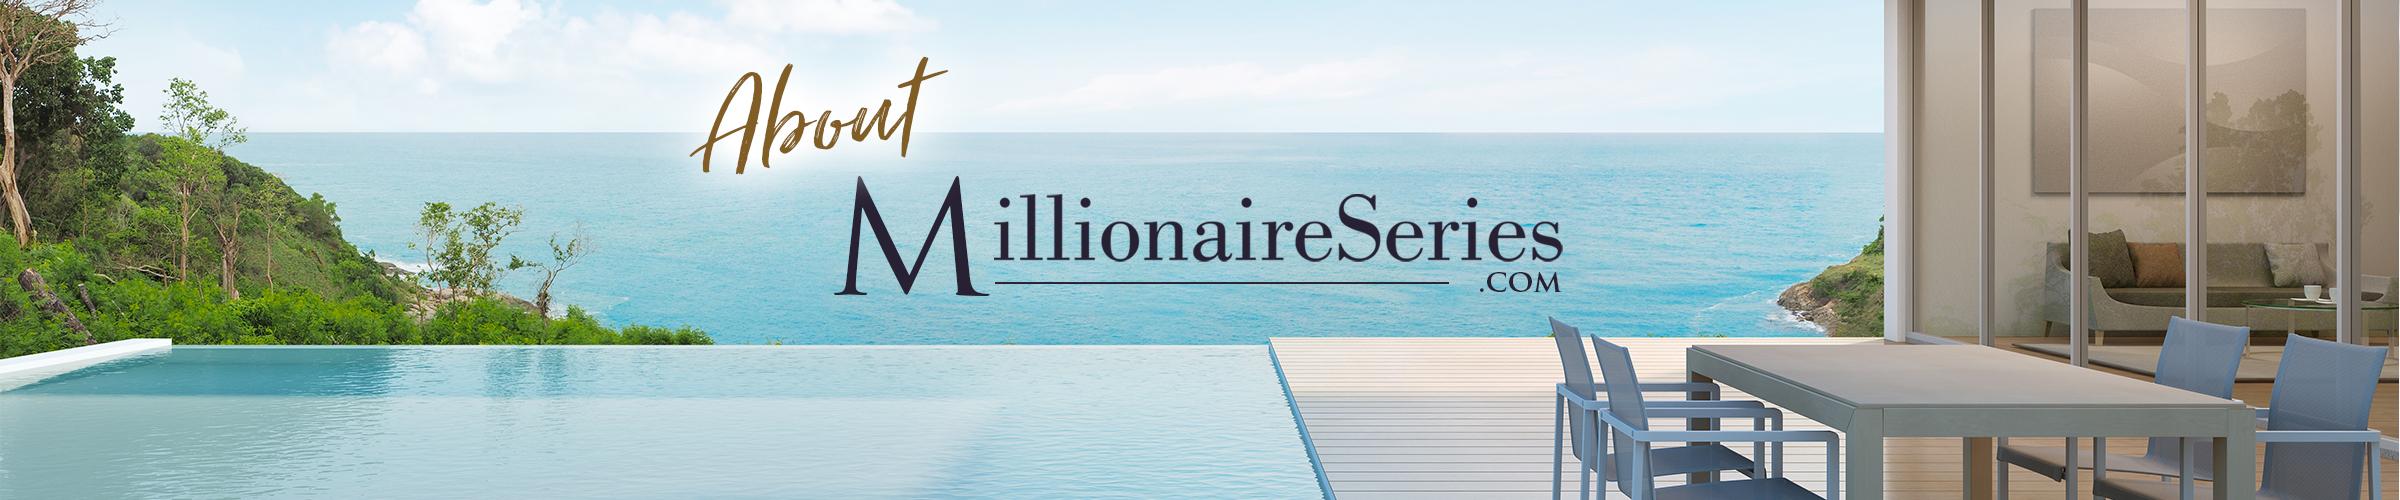 about millionaireseries.com